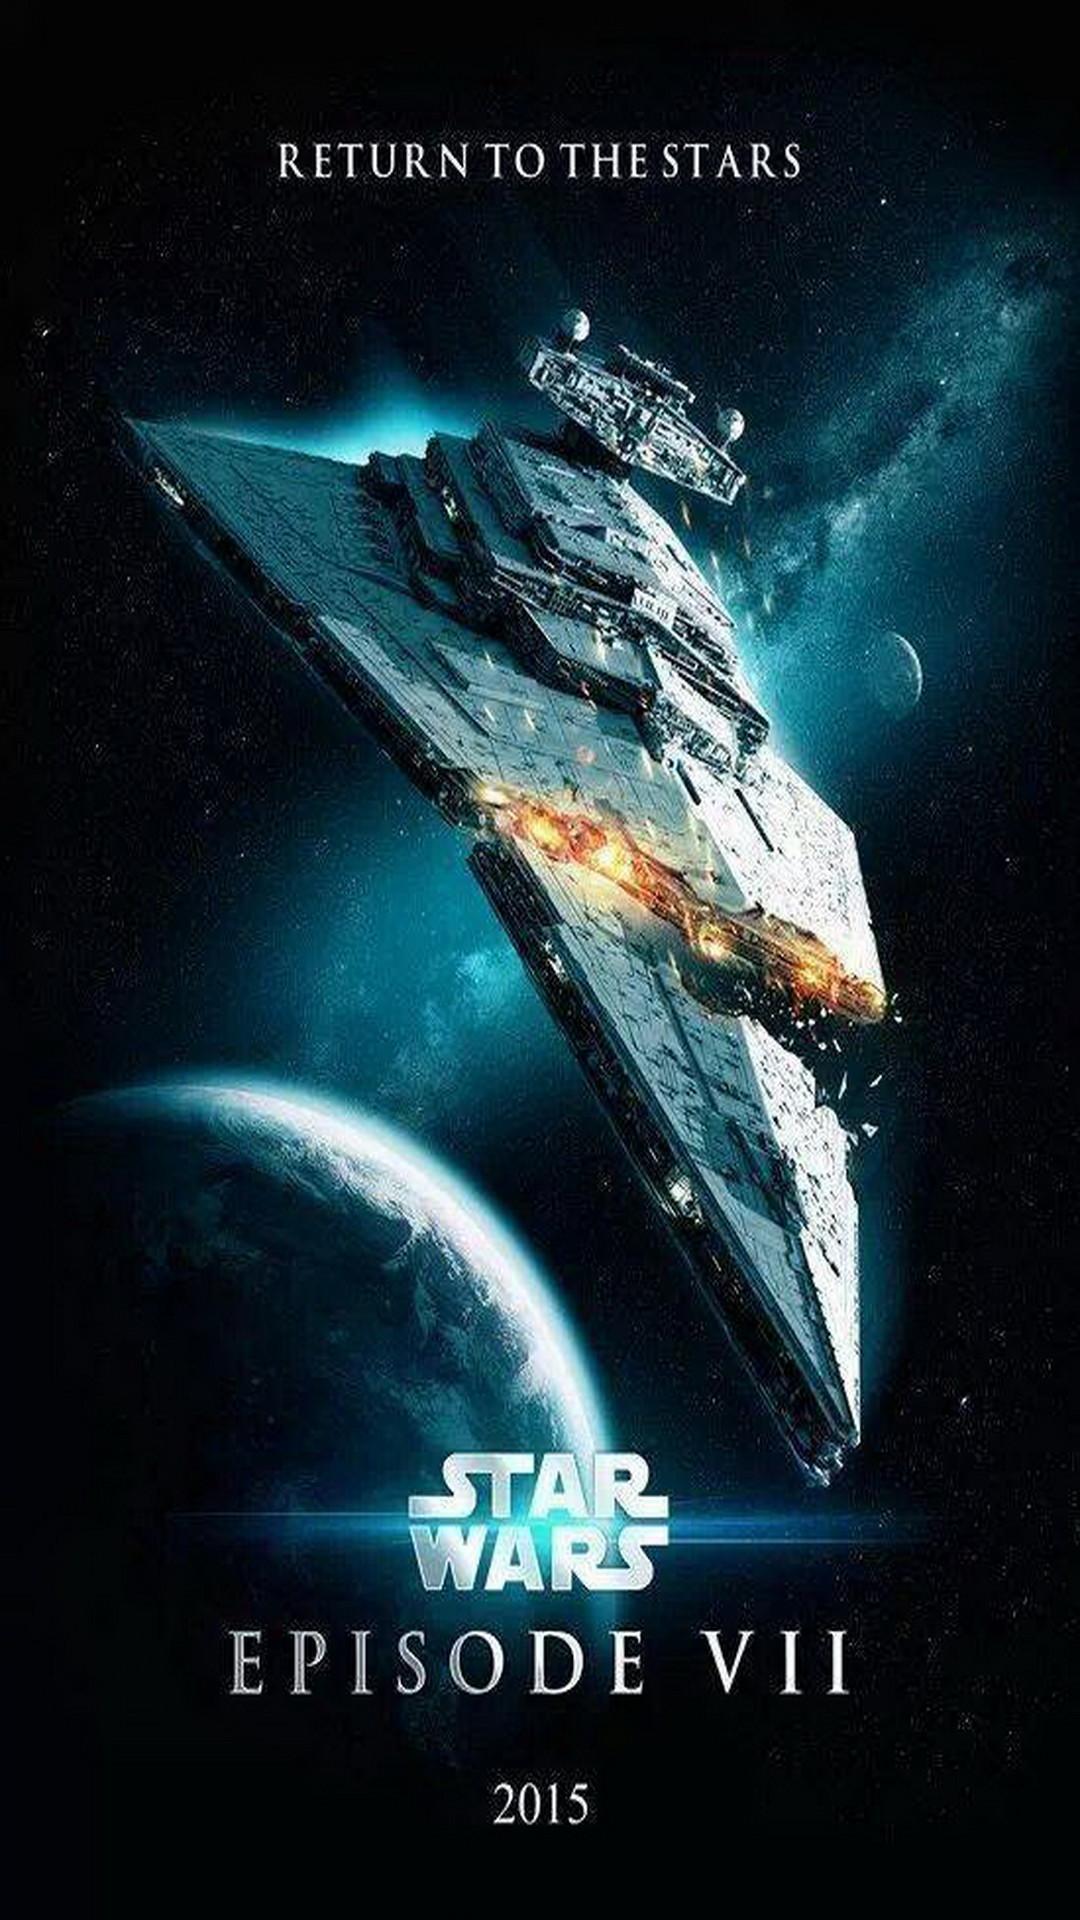 Star Wars Episode VII photos of Epic Star Wars Iphone Wallpaper .